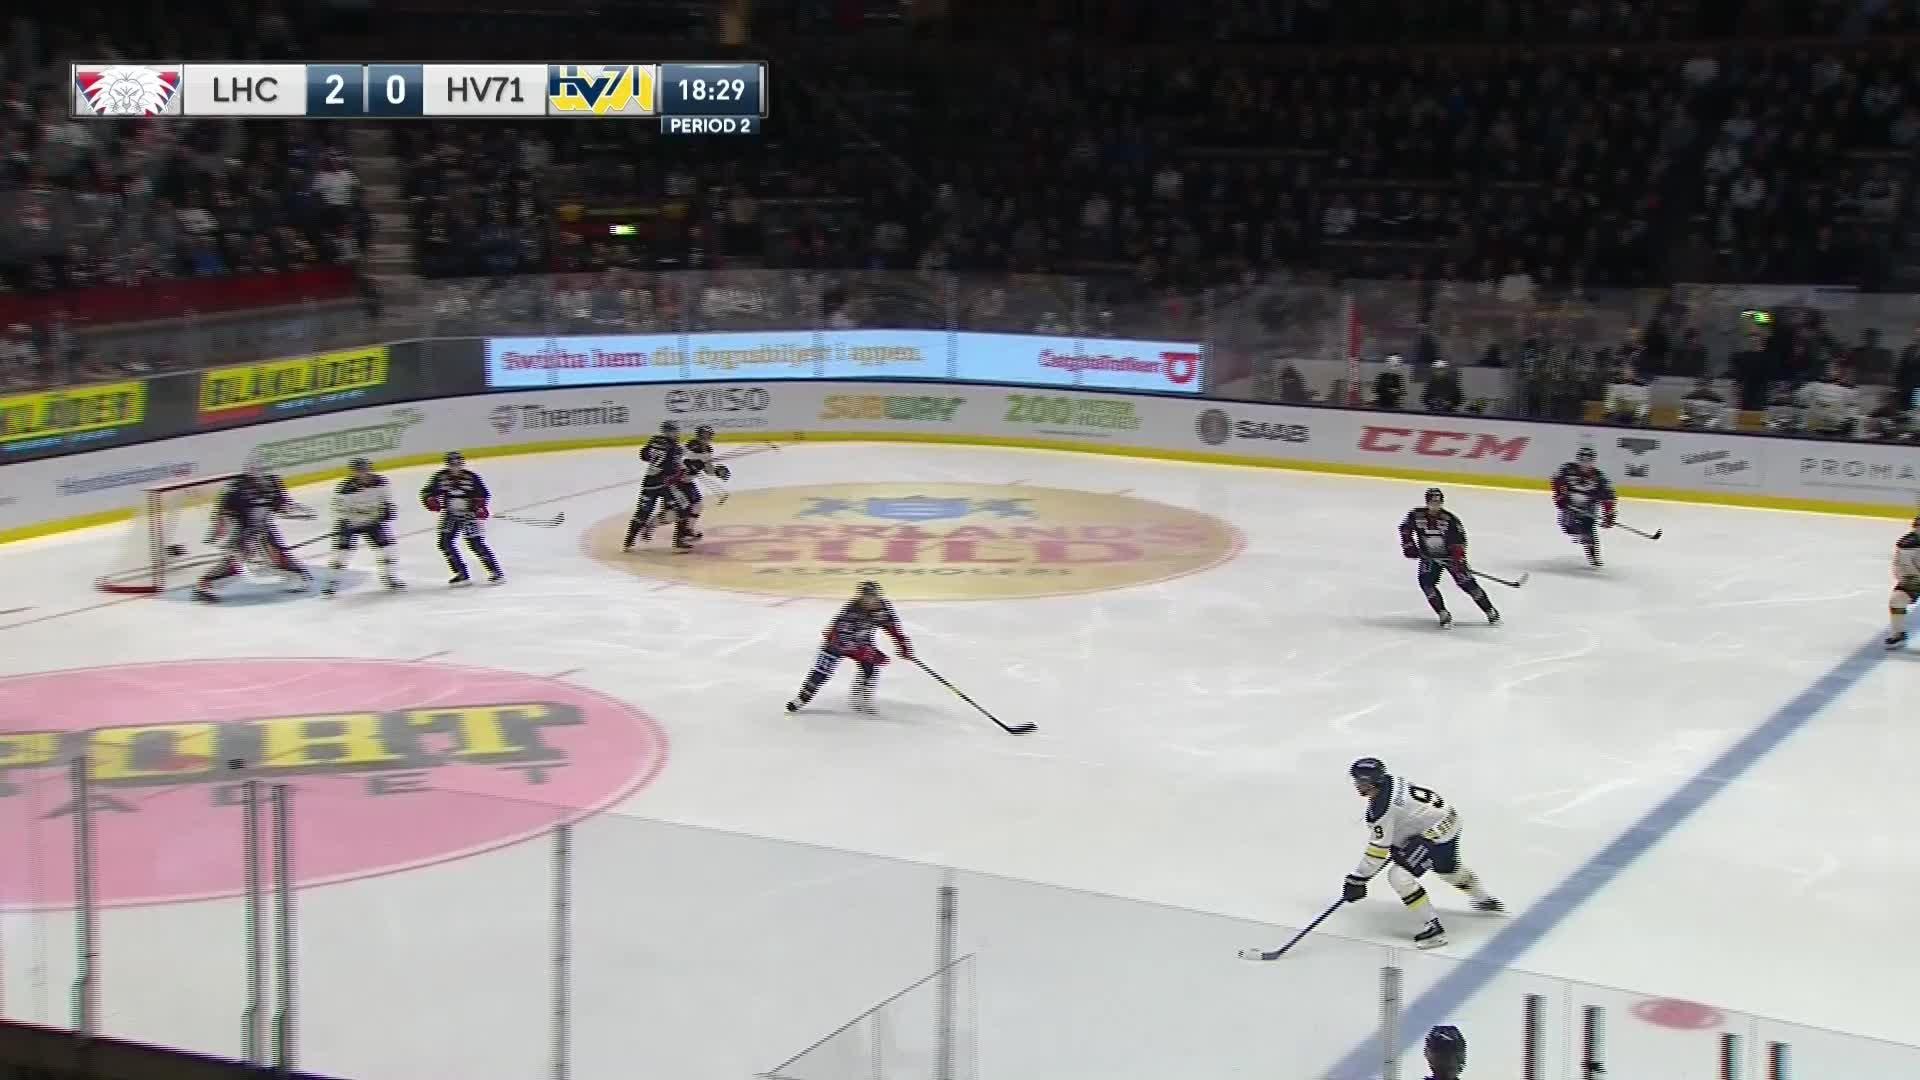 Linköping HC - HV71 2-1